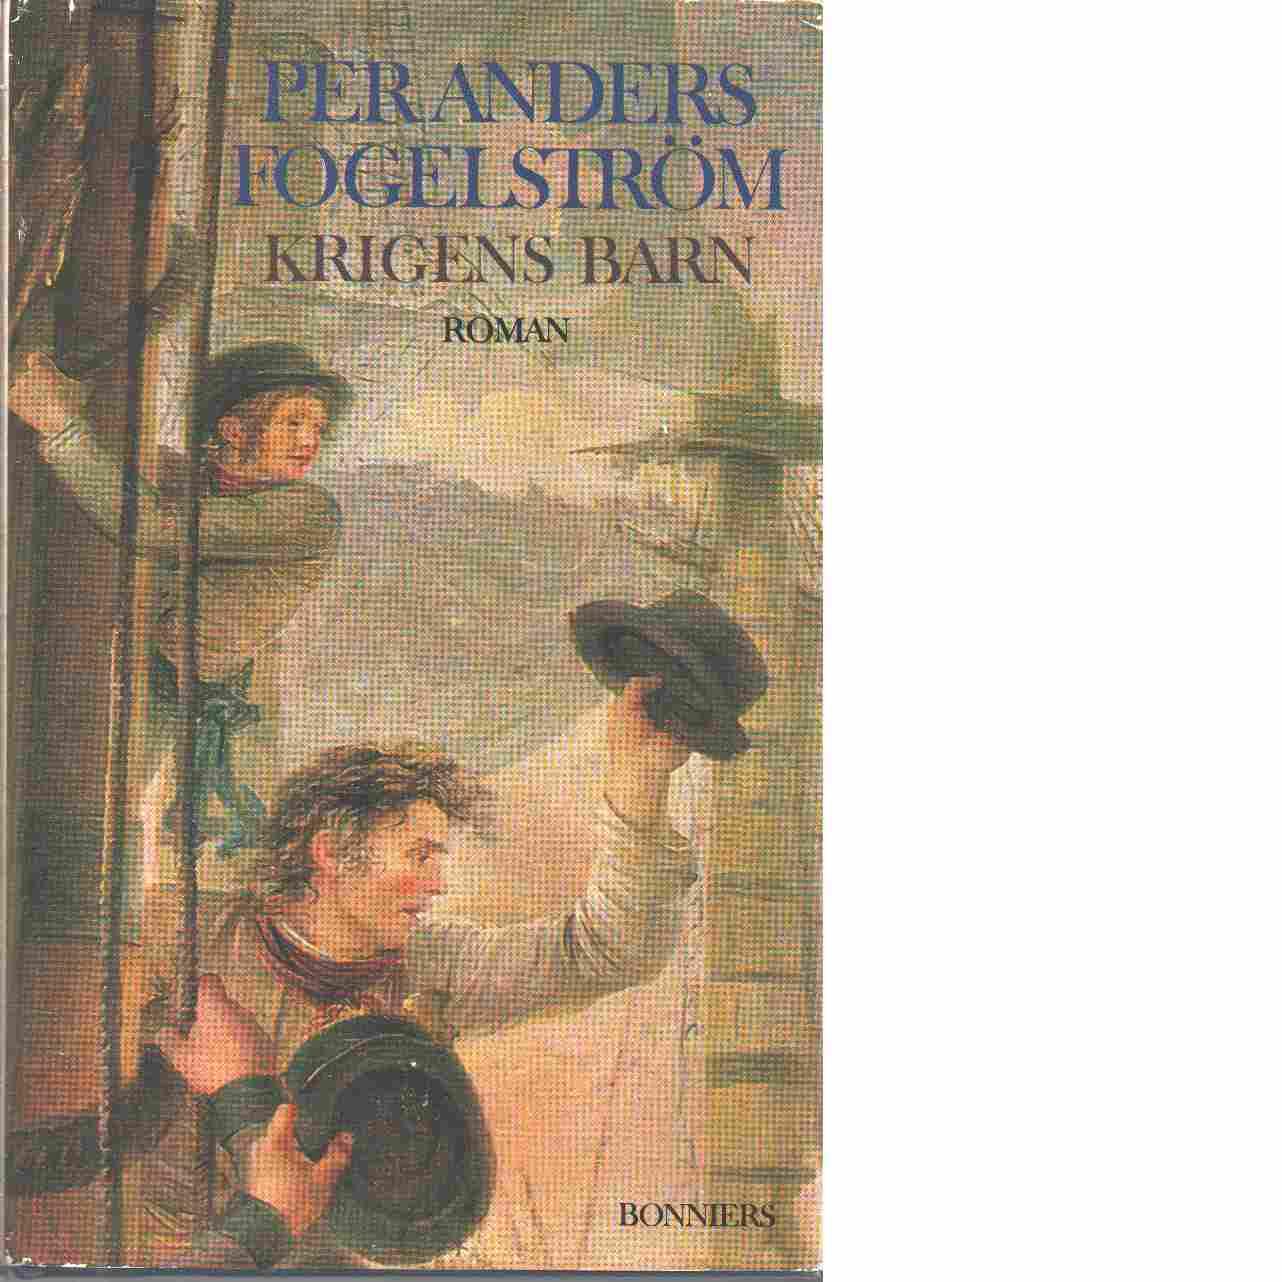 Krigens barn : roman - Fogelström, Per Anders